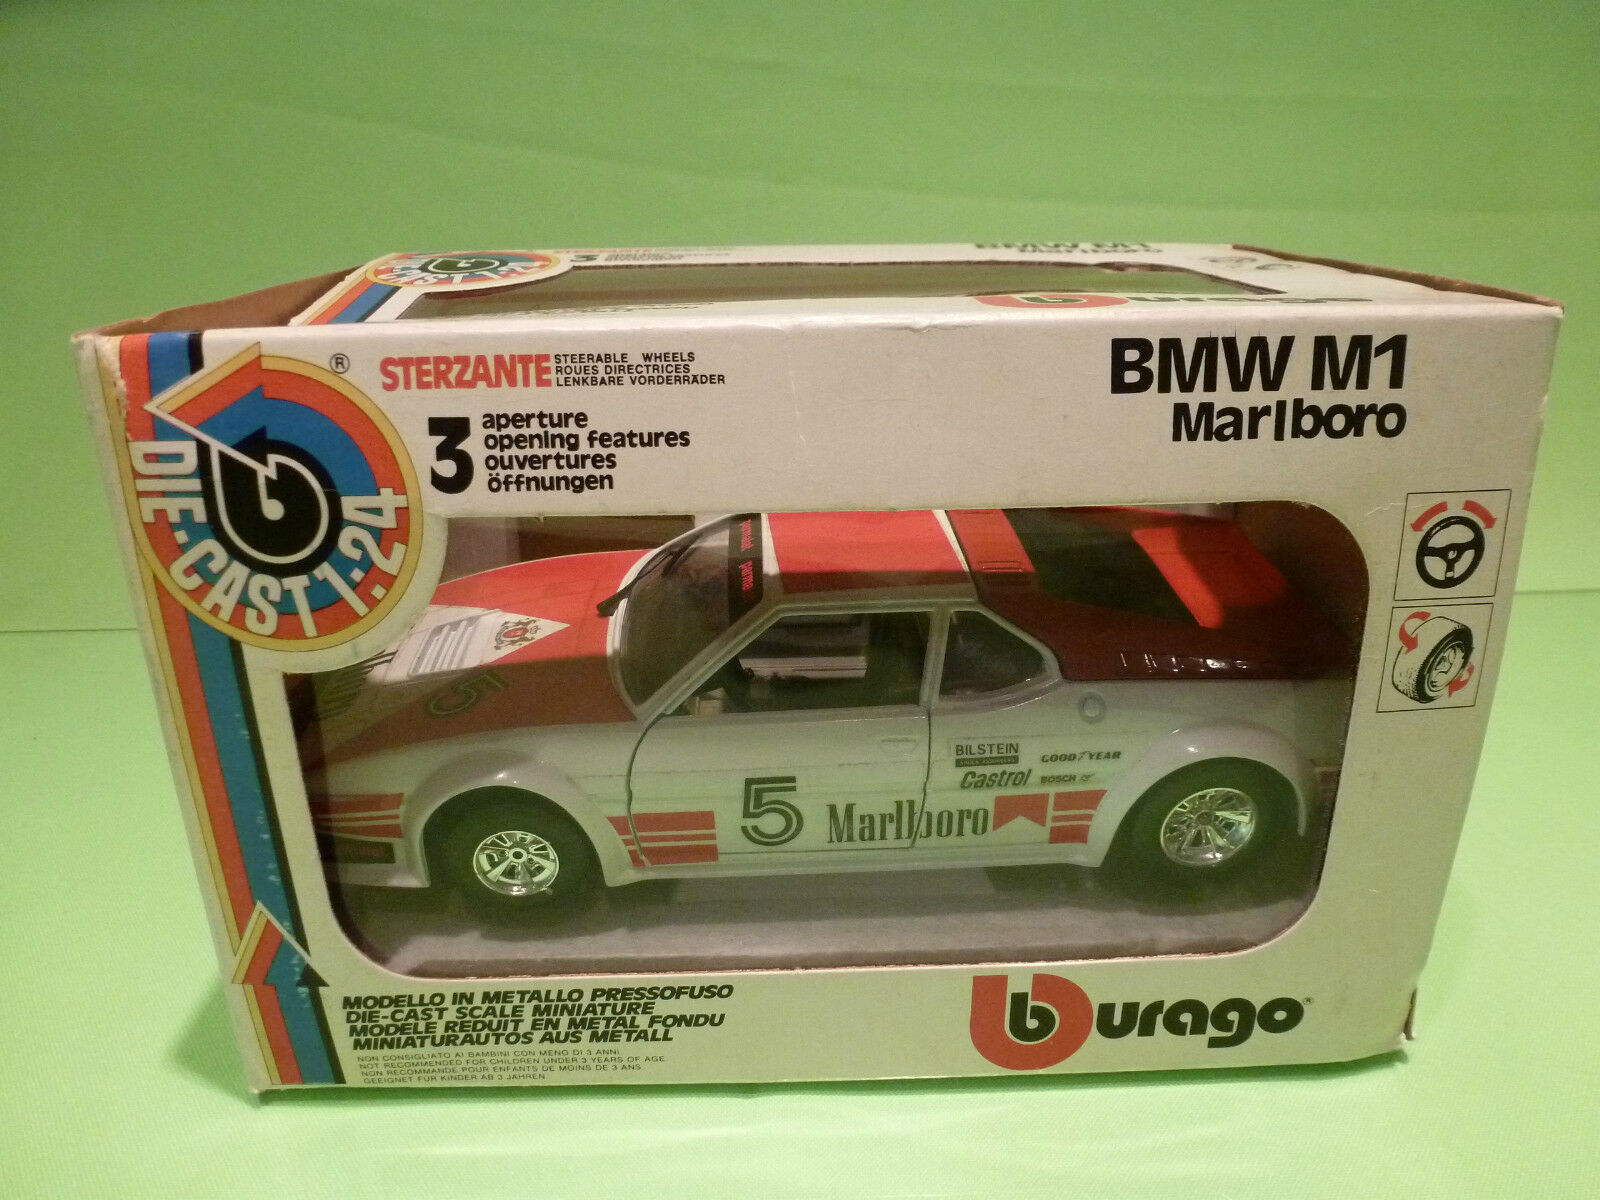 BBURAGO 1 24  BMW M1 MARLBor  0169  - IN ORIGINAL BOX   - GOOD CONDITION